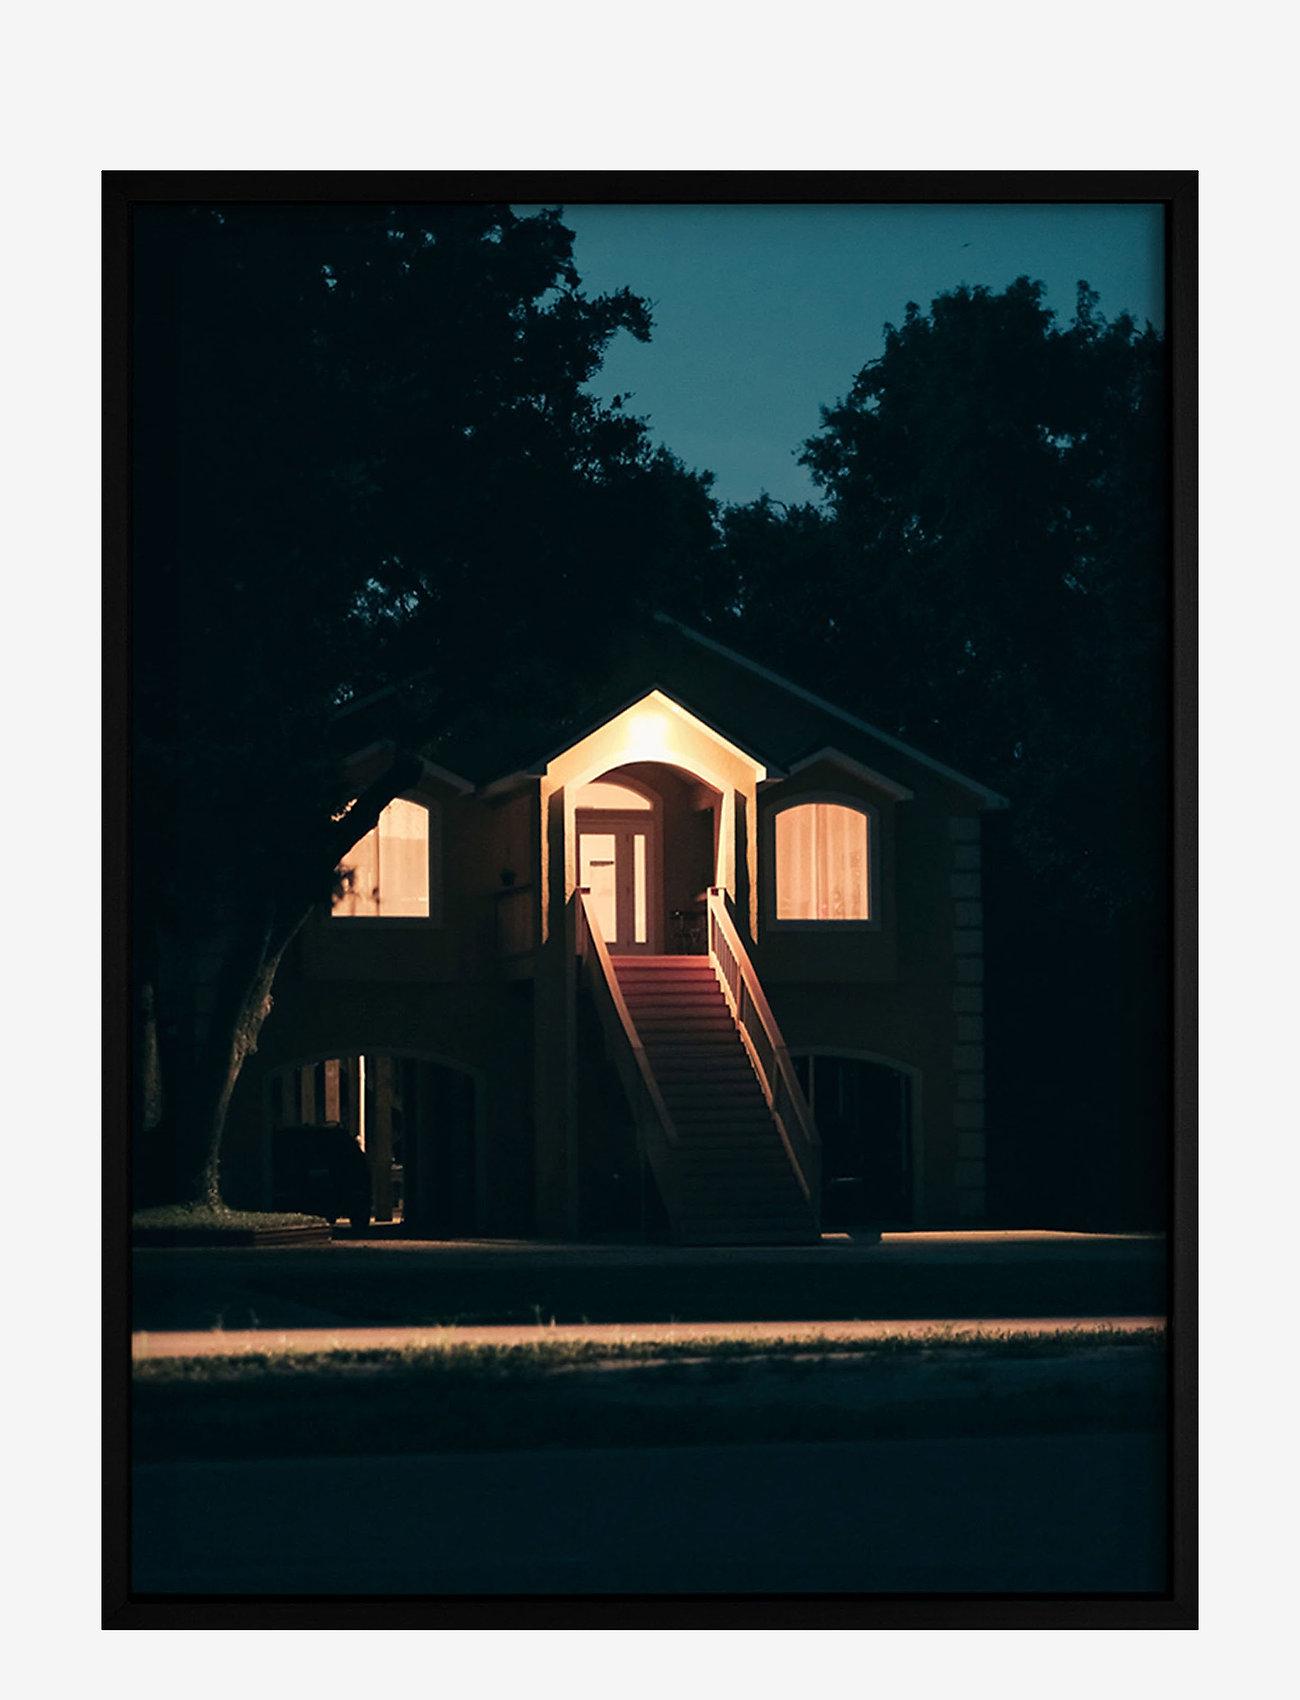 Democratic Gallery - PosterAt Dusk - home decor - orange - 0